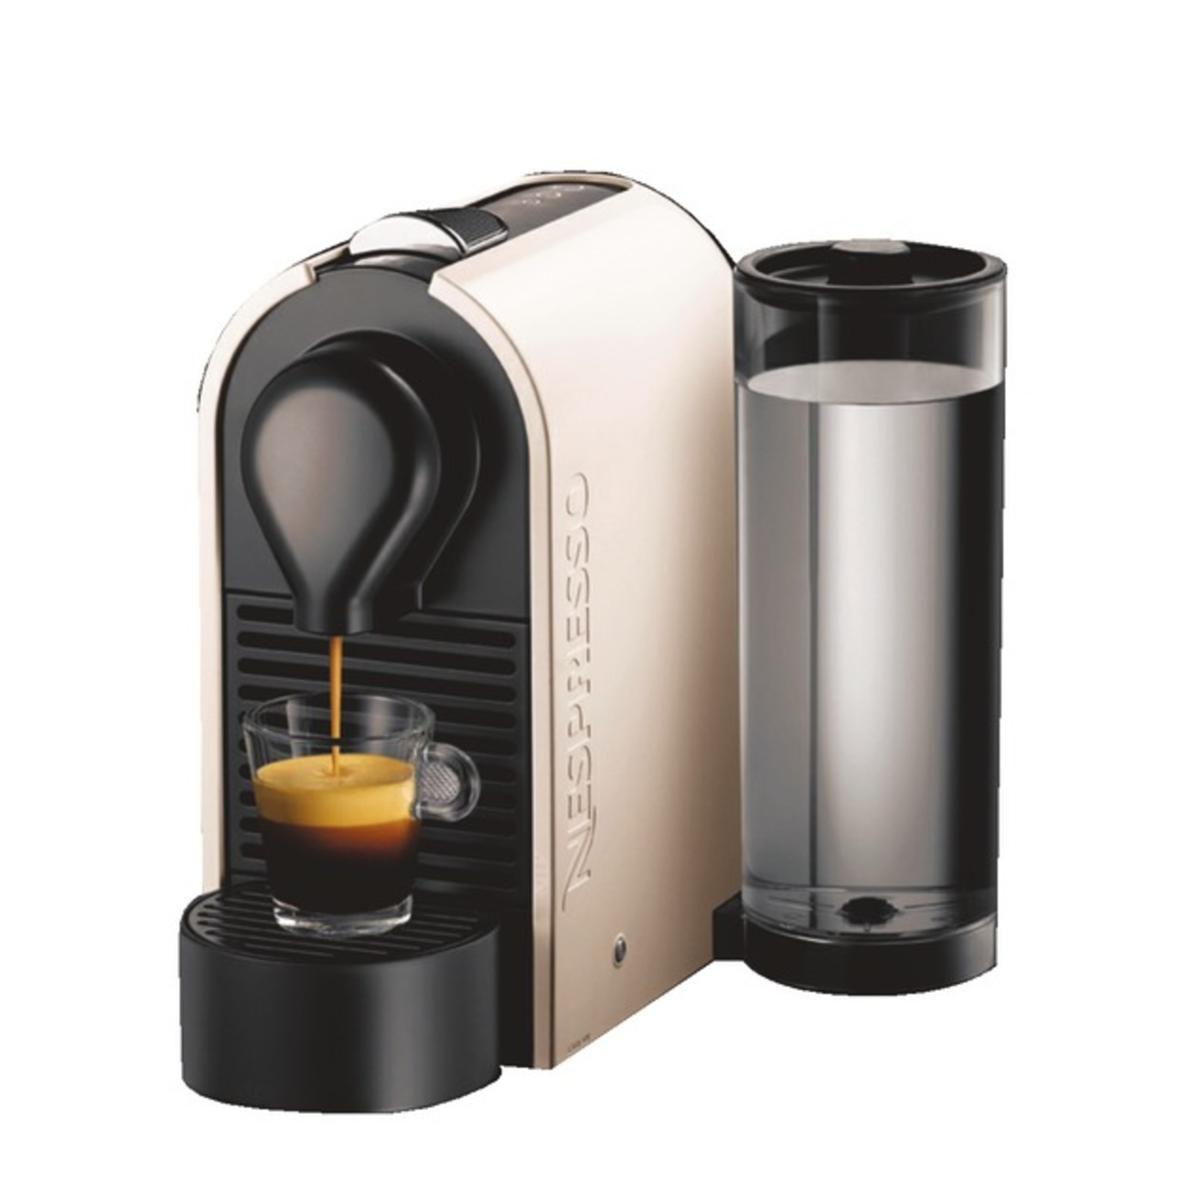 cafetiere nespresso u pure. Black Bedroom Furniture Sets. Home Design Ideas